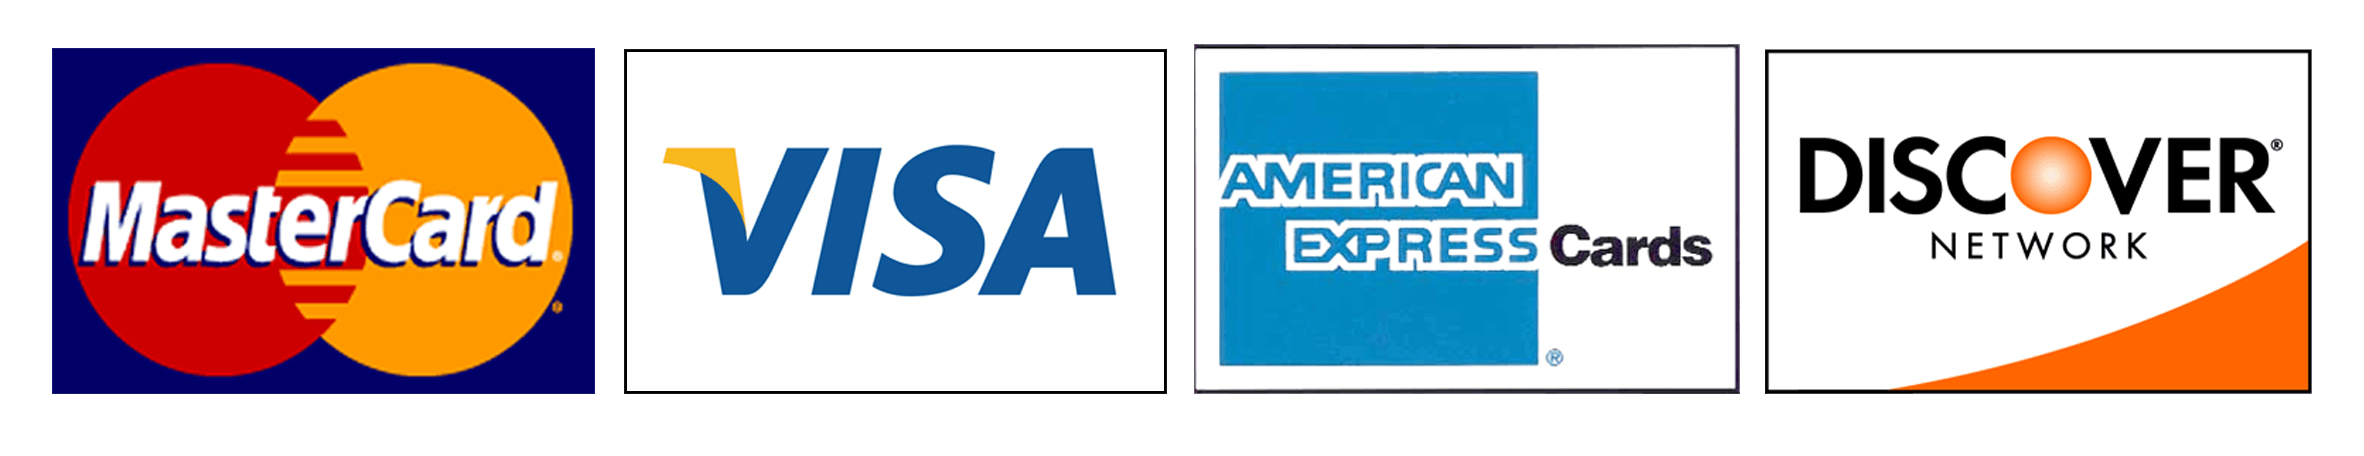 American Express Visa MasterCard Logo - LogoDix